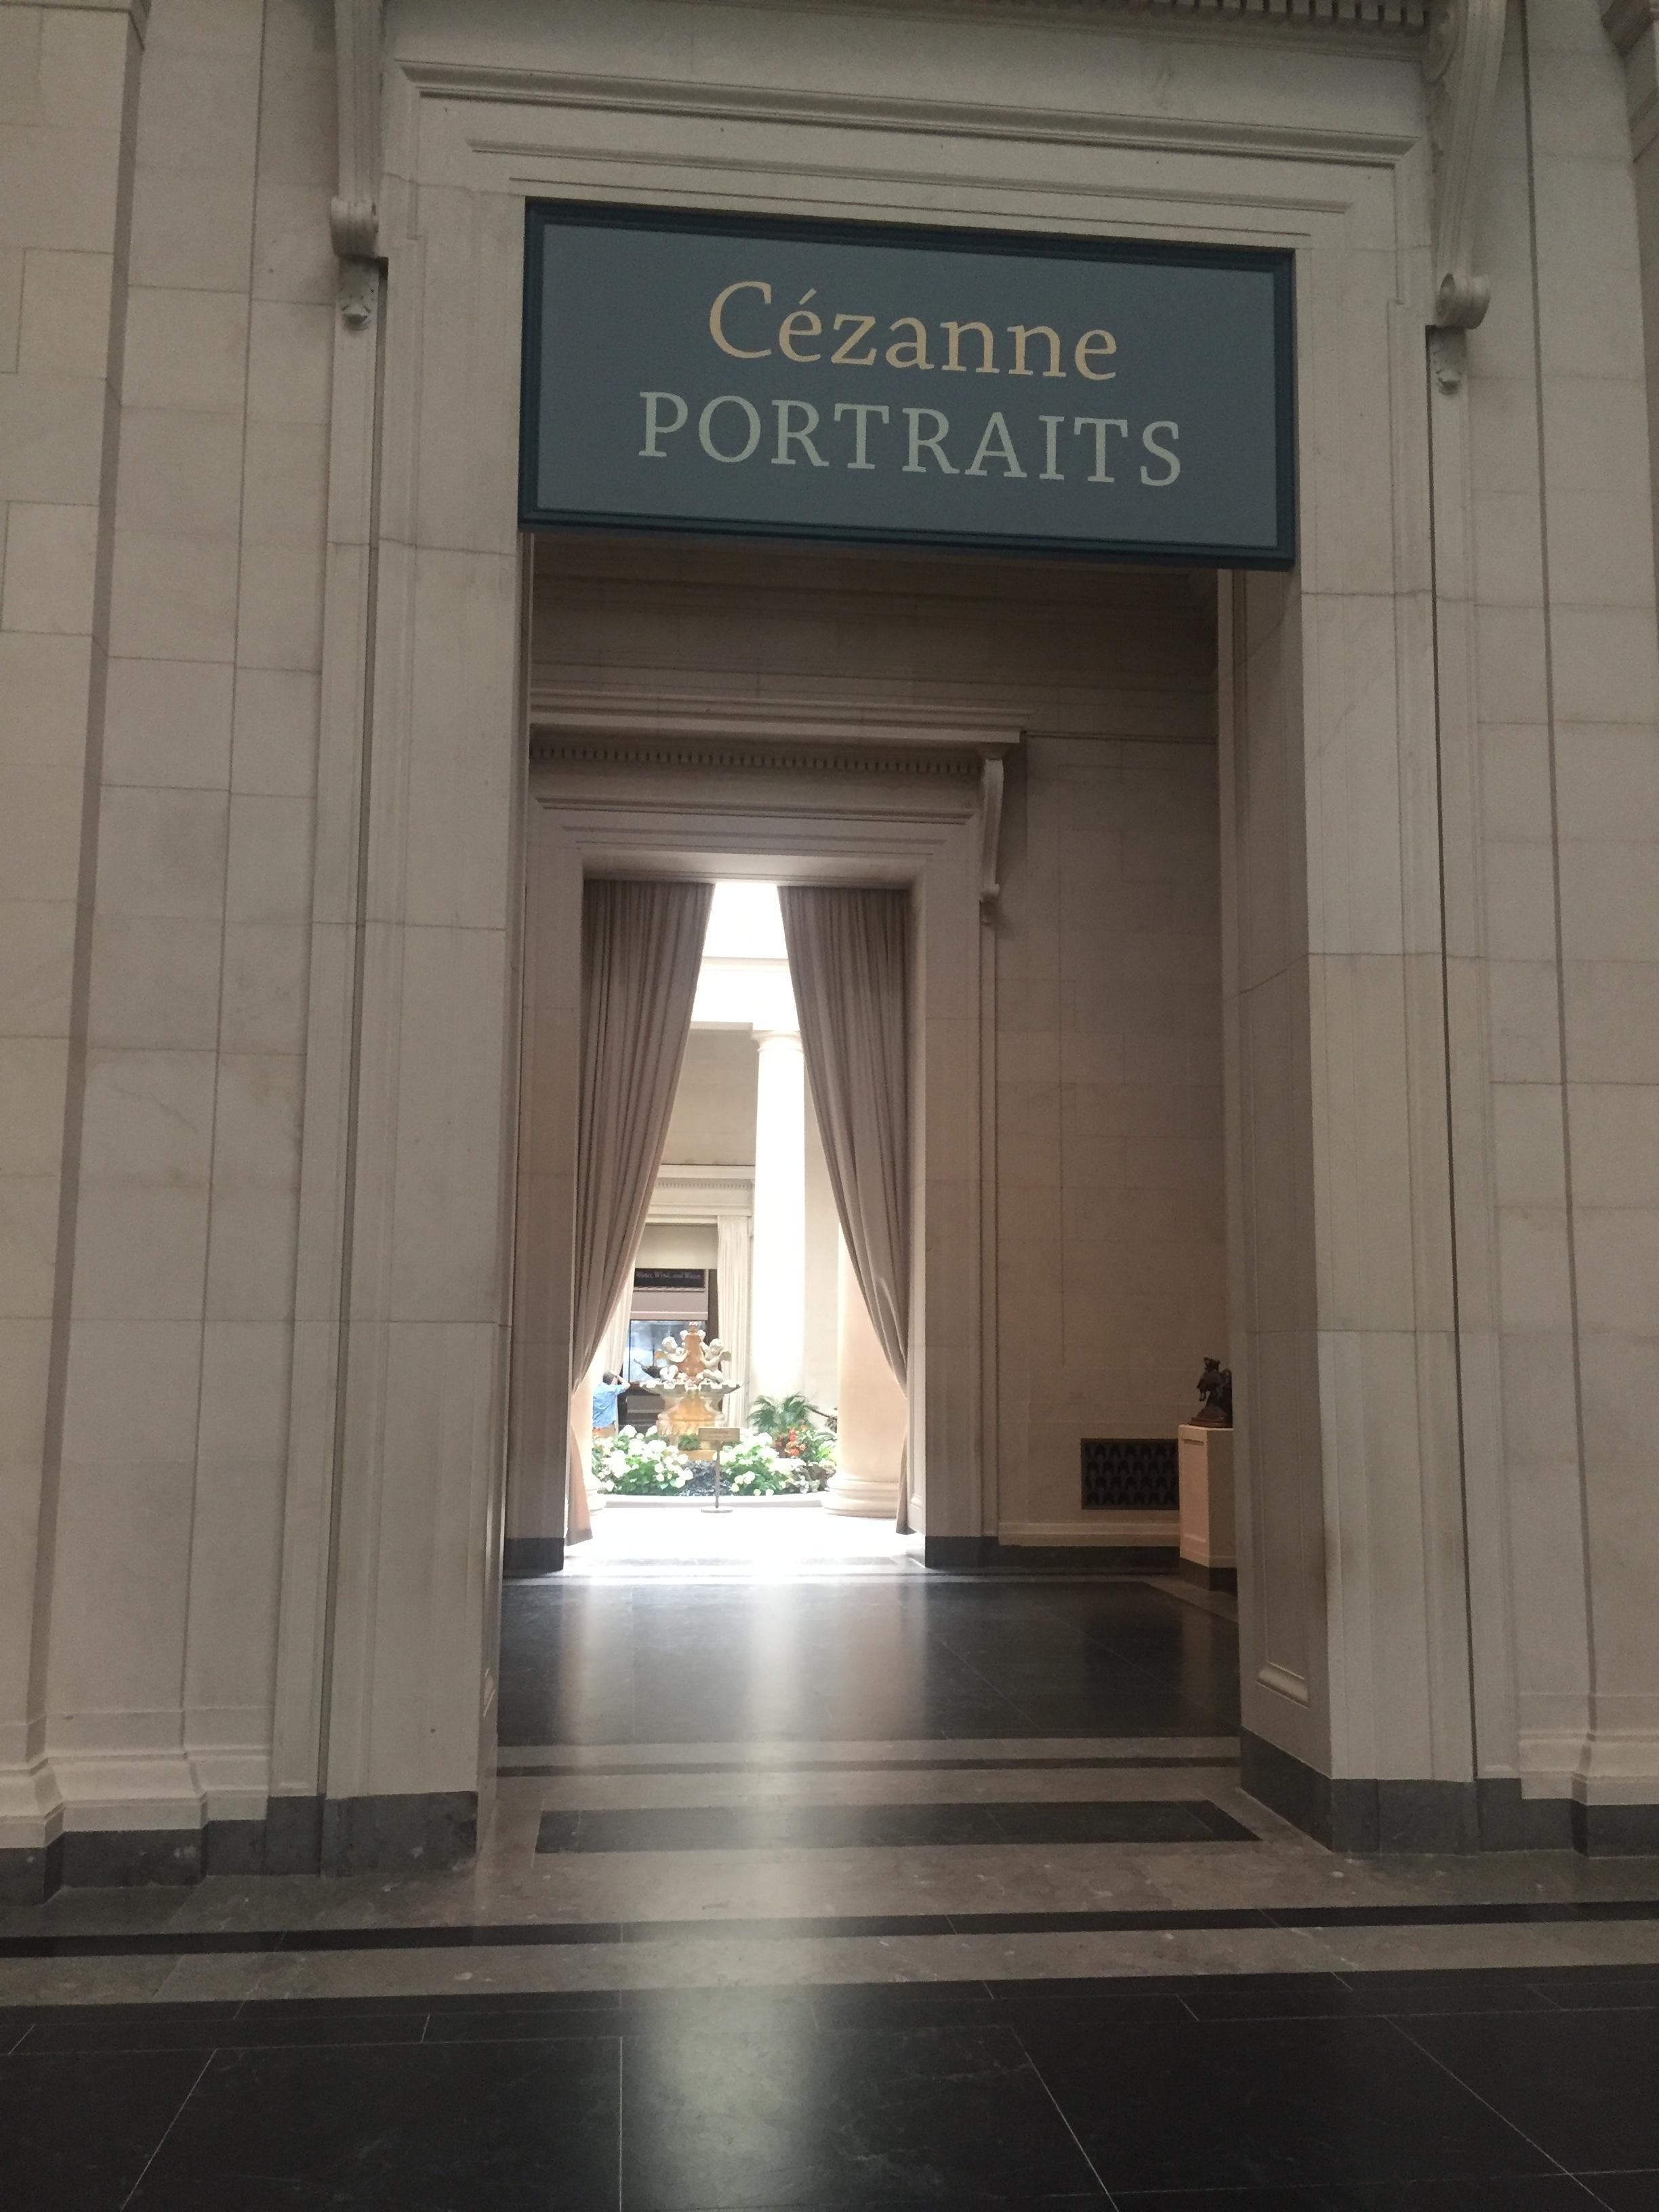 cezanne portraits national gallery hallway 2018 washington dc.JPG